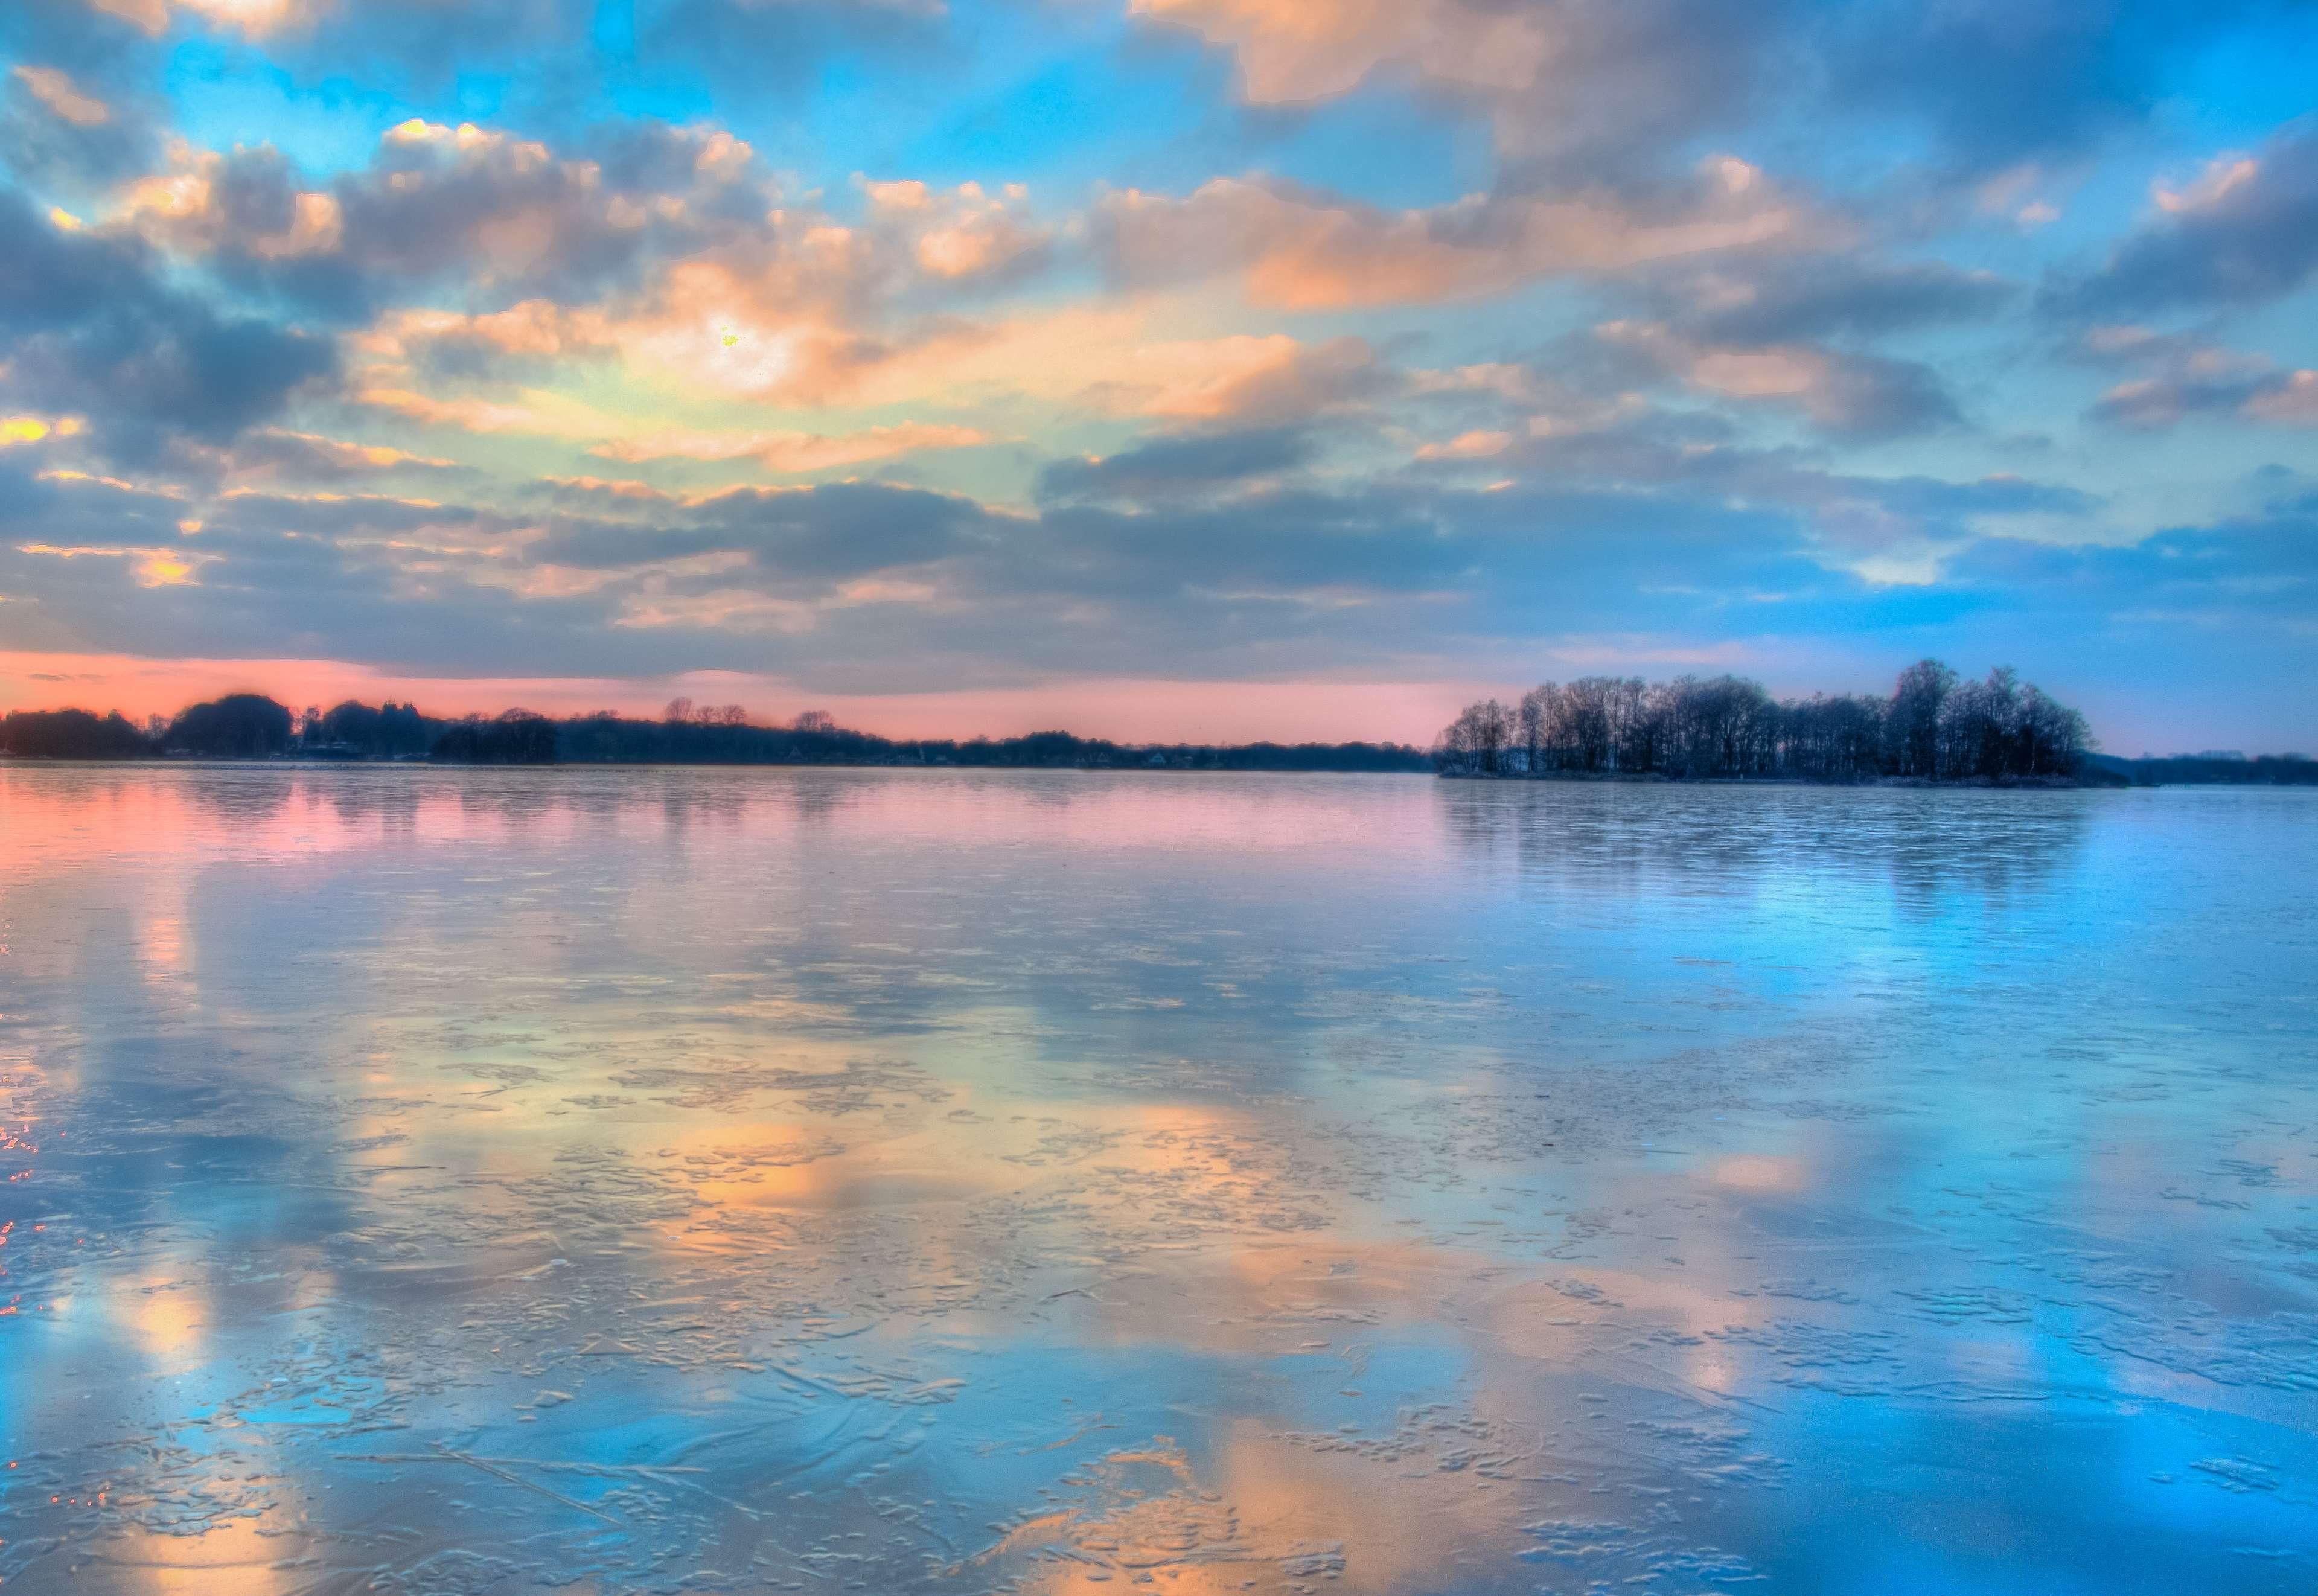 Clouds Colorful Colourful Ice Lake Landscape Nature Overcast Reflection River Scenery Sky Sunrise Suns Scenic Photography Sunset Photos Landscape